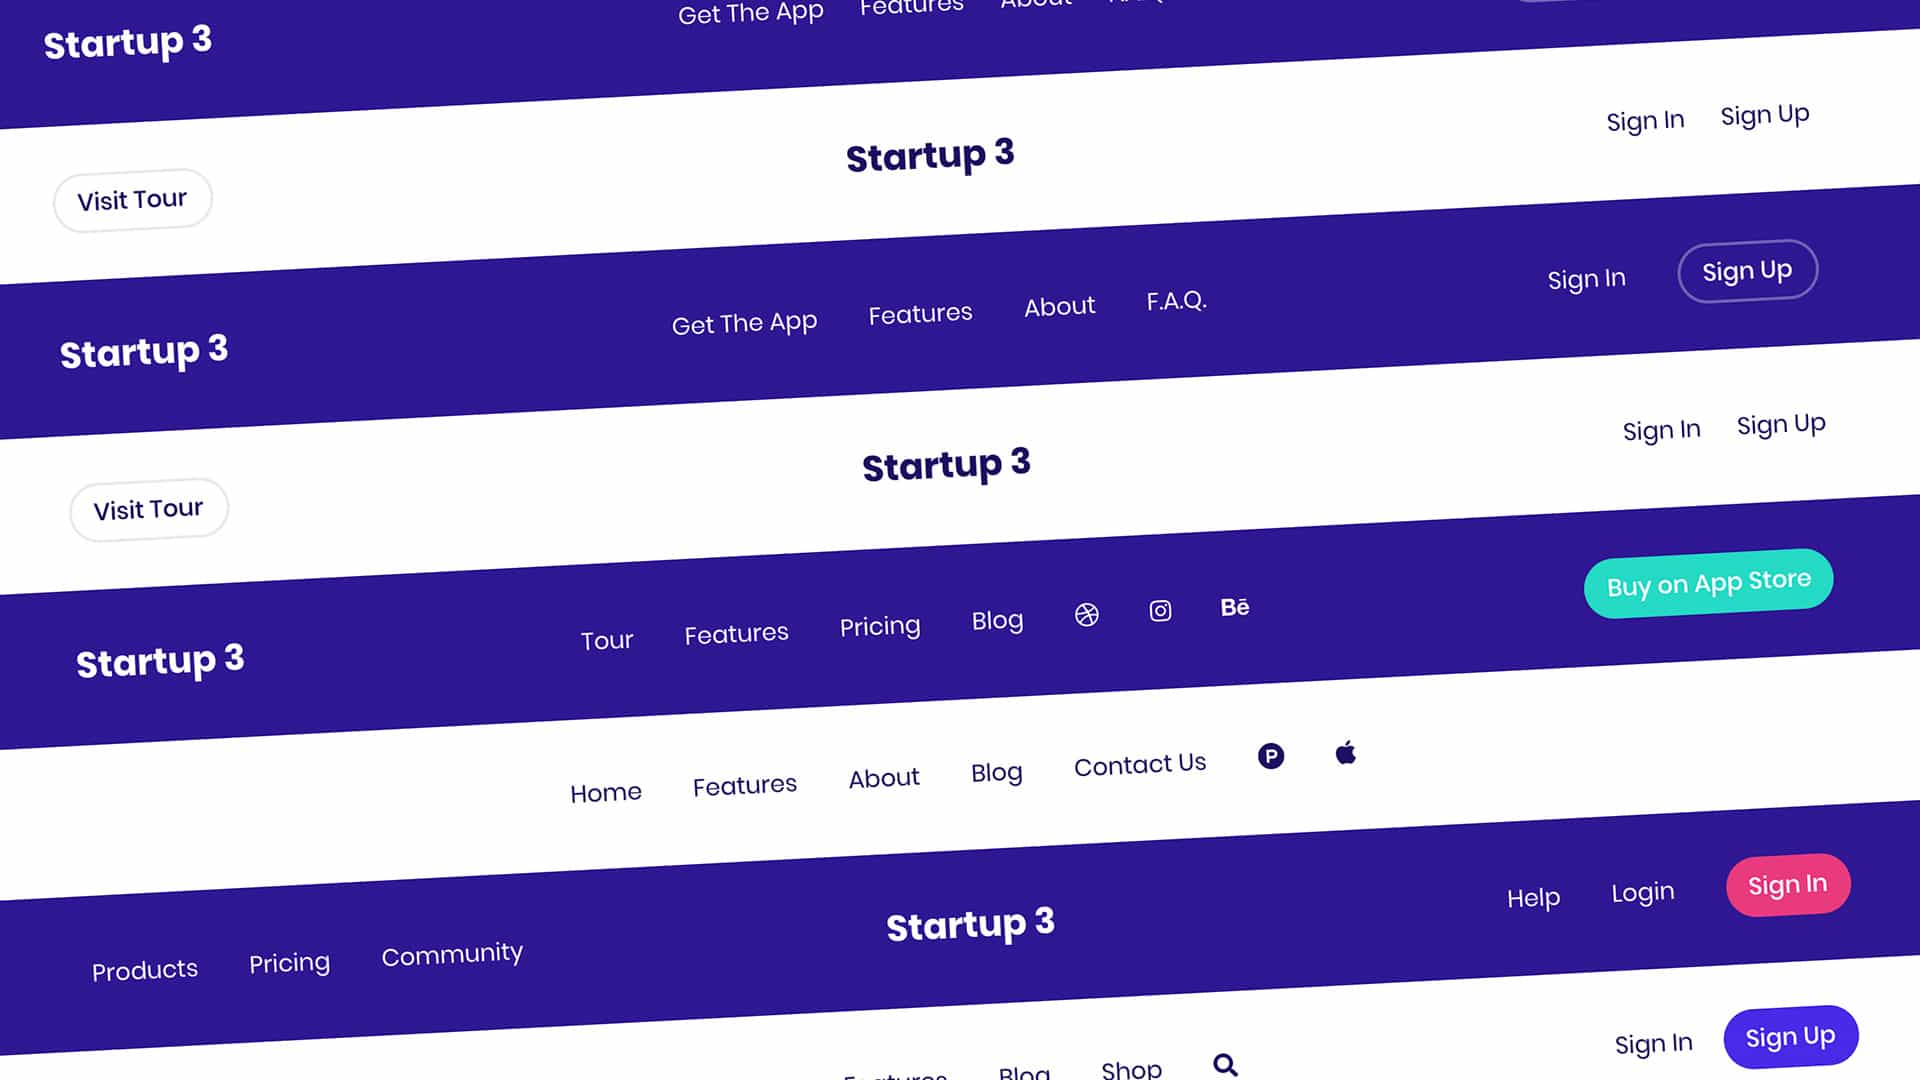 Bootstrap Navbar Guide and Free Navigation Examples - Designmodo